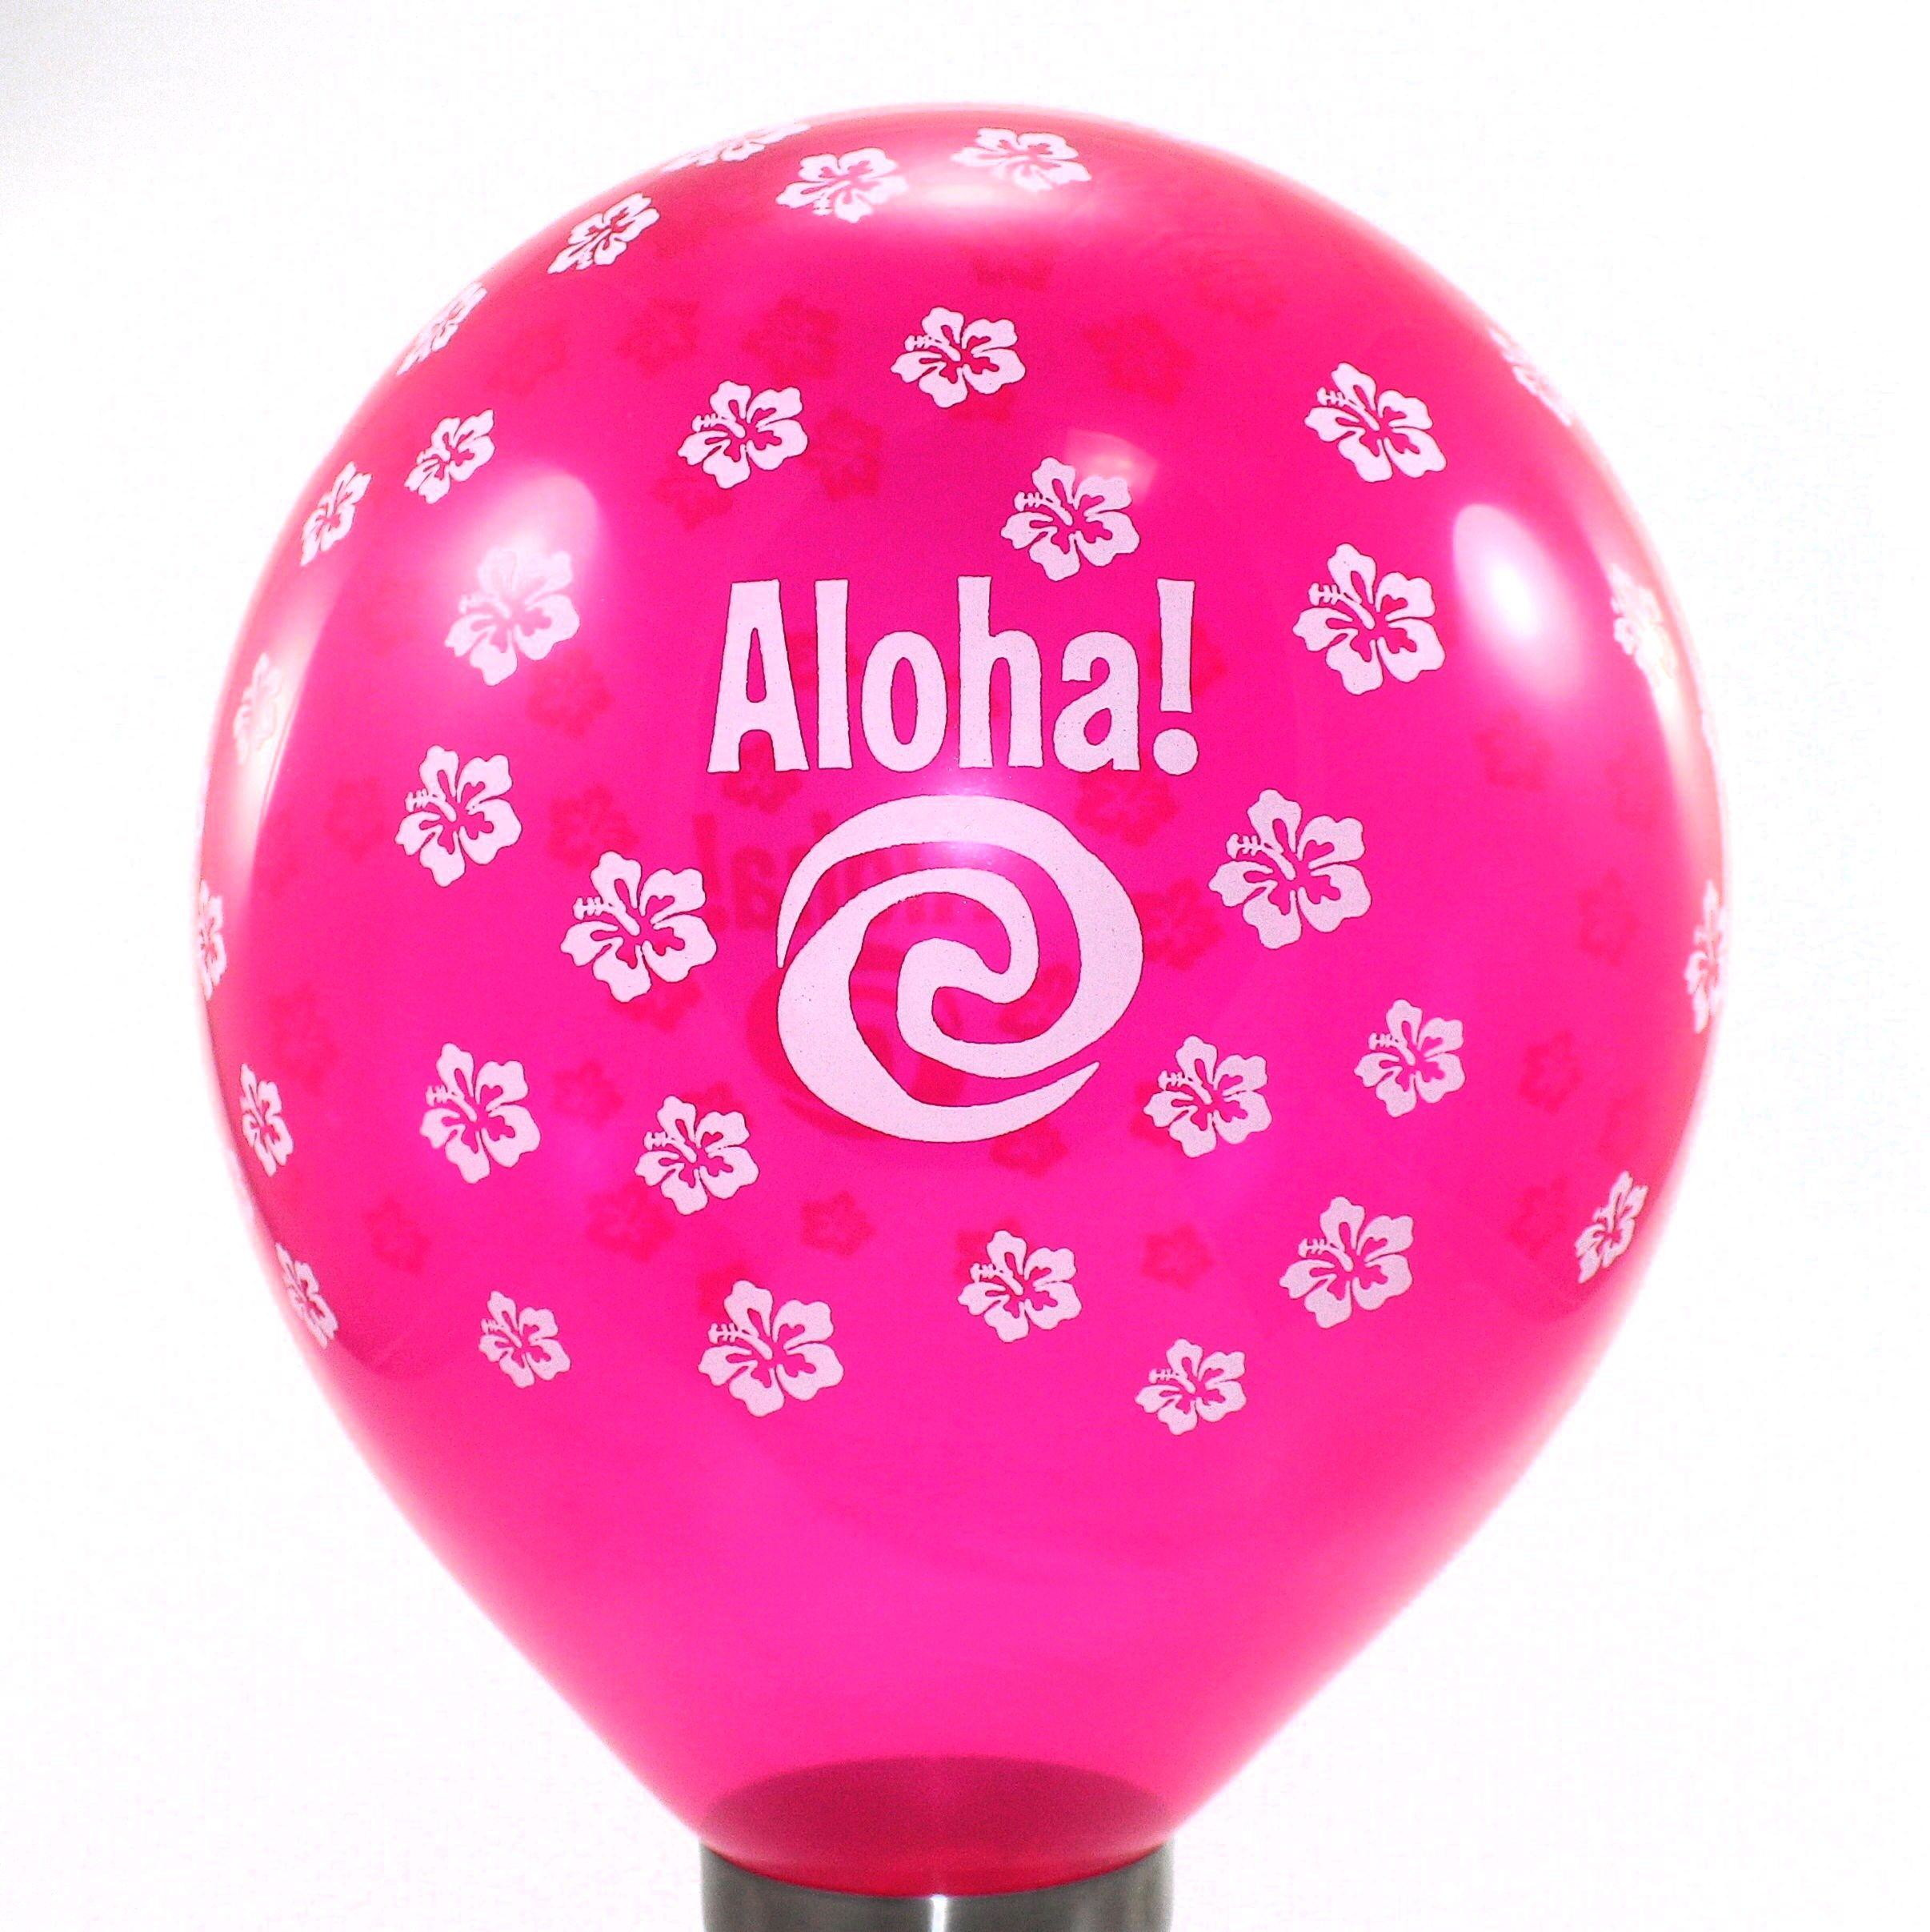 40 Unidades Balão Bexiga Festa Havaiana 7 Cores No Elo7 Mi